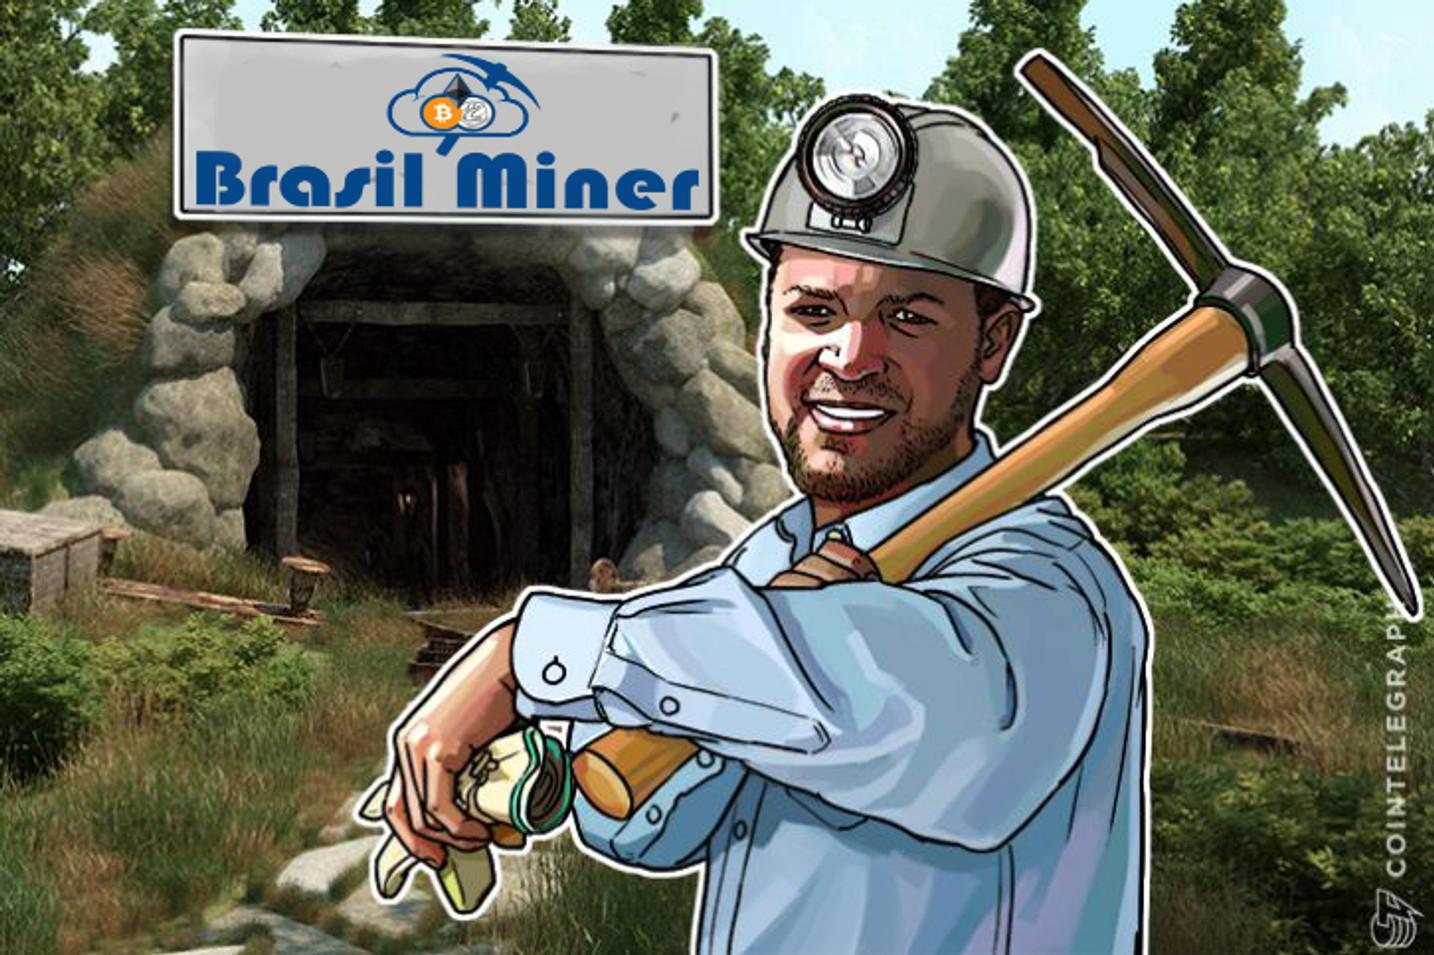 É possível minerar Bitcoin no Brasil?